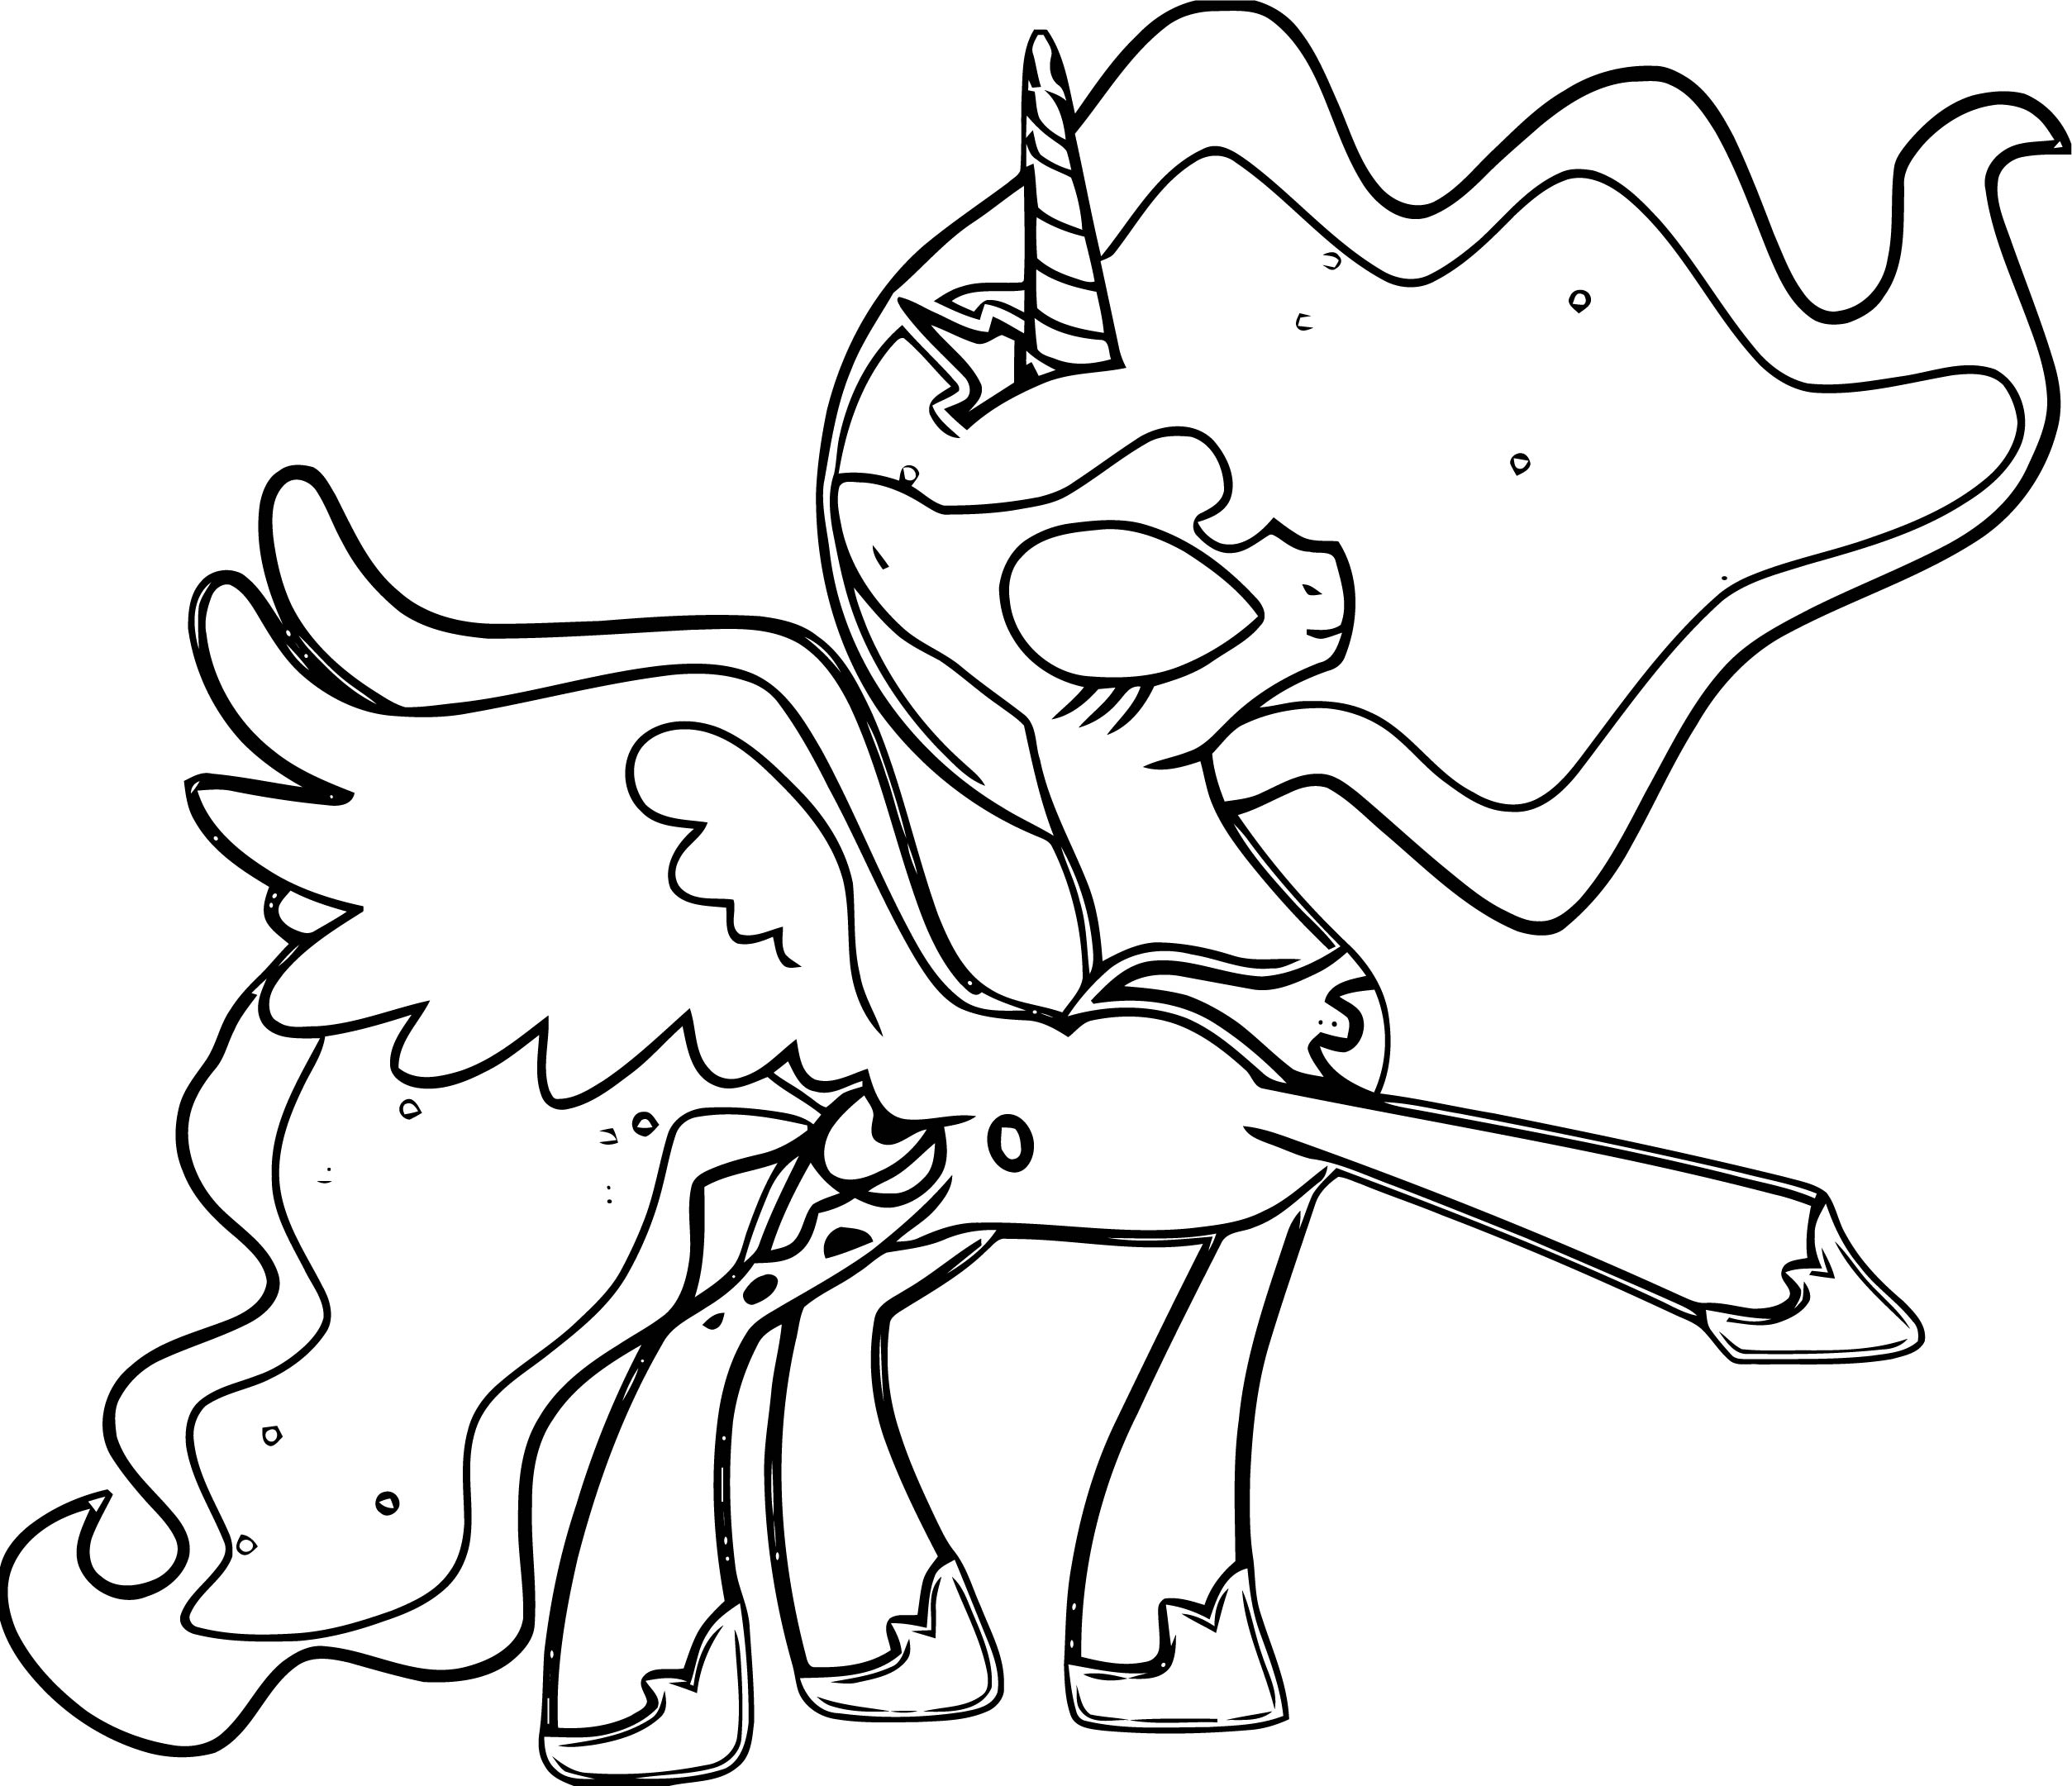 Princess Twilight Sparkle Coloring Page 182